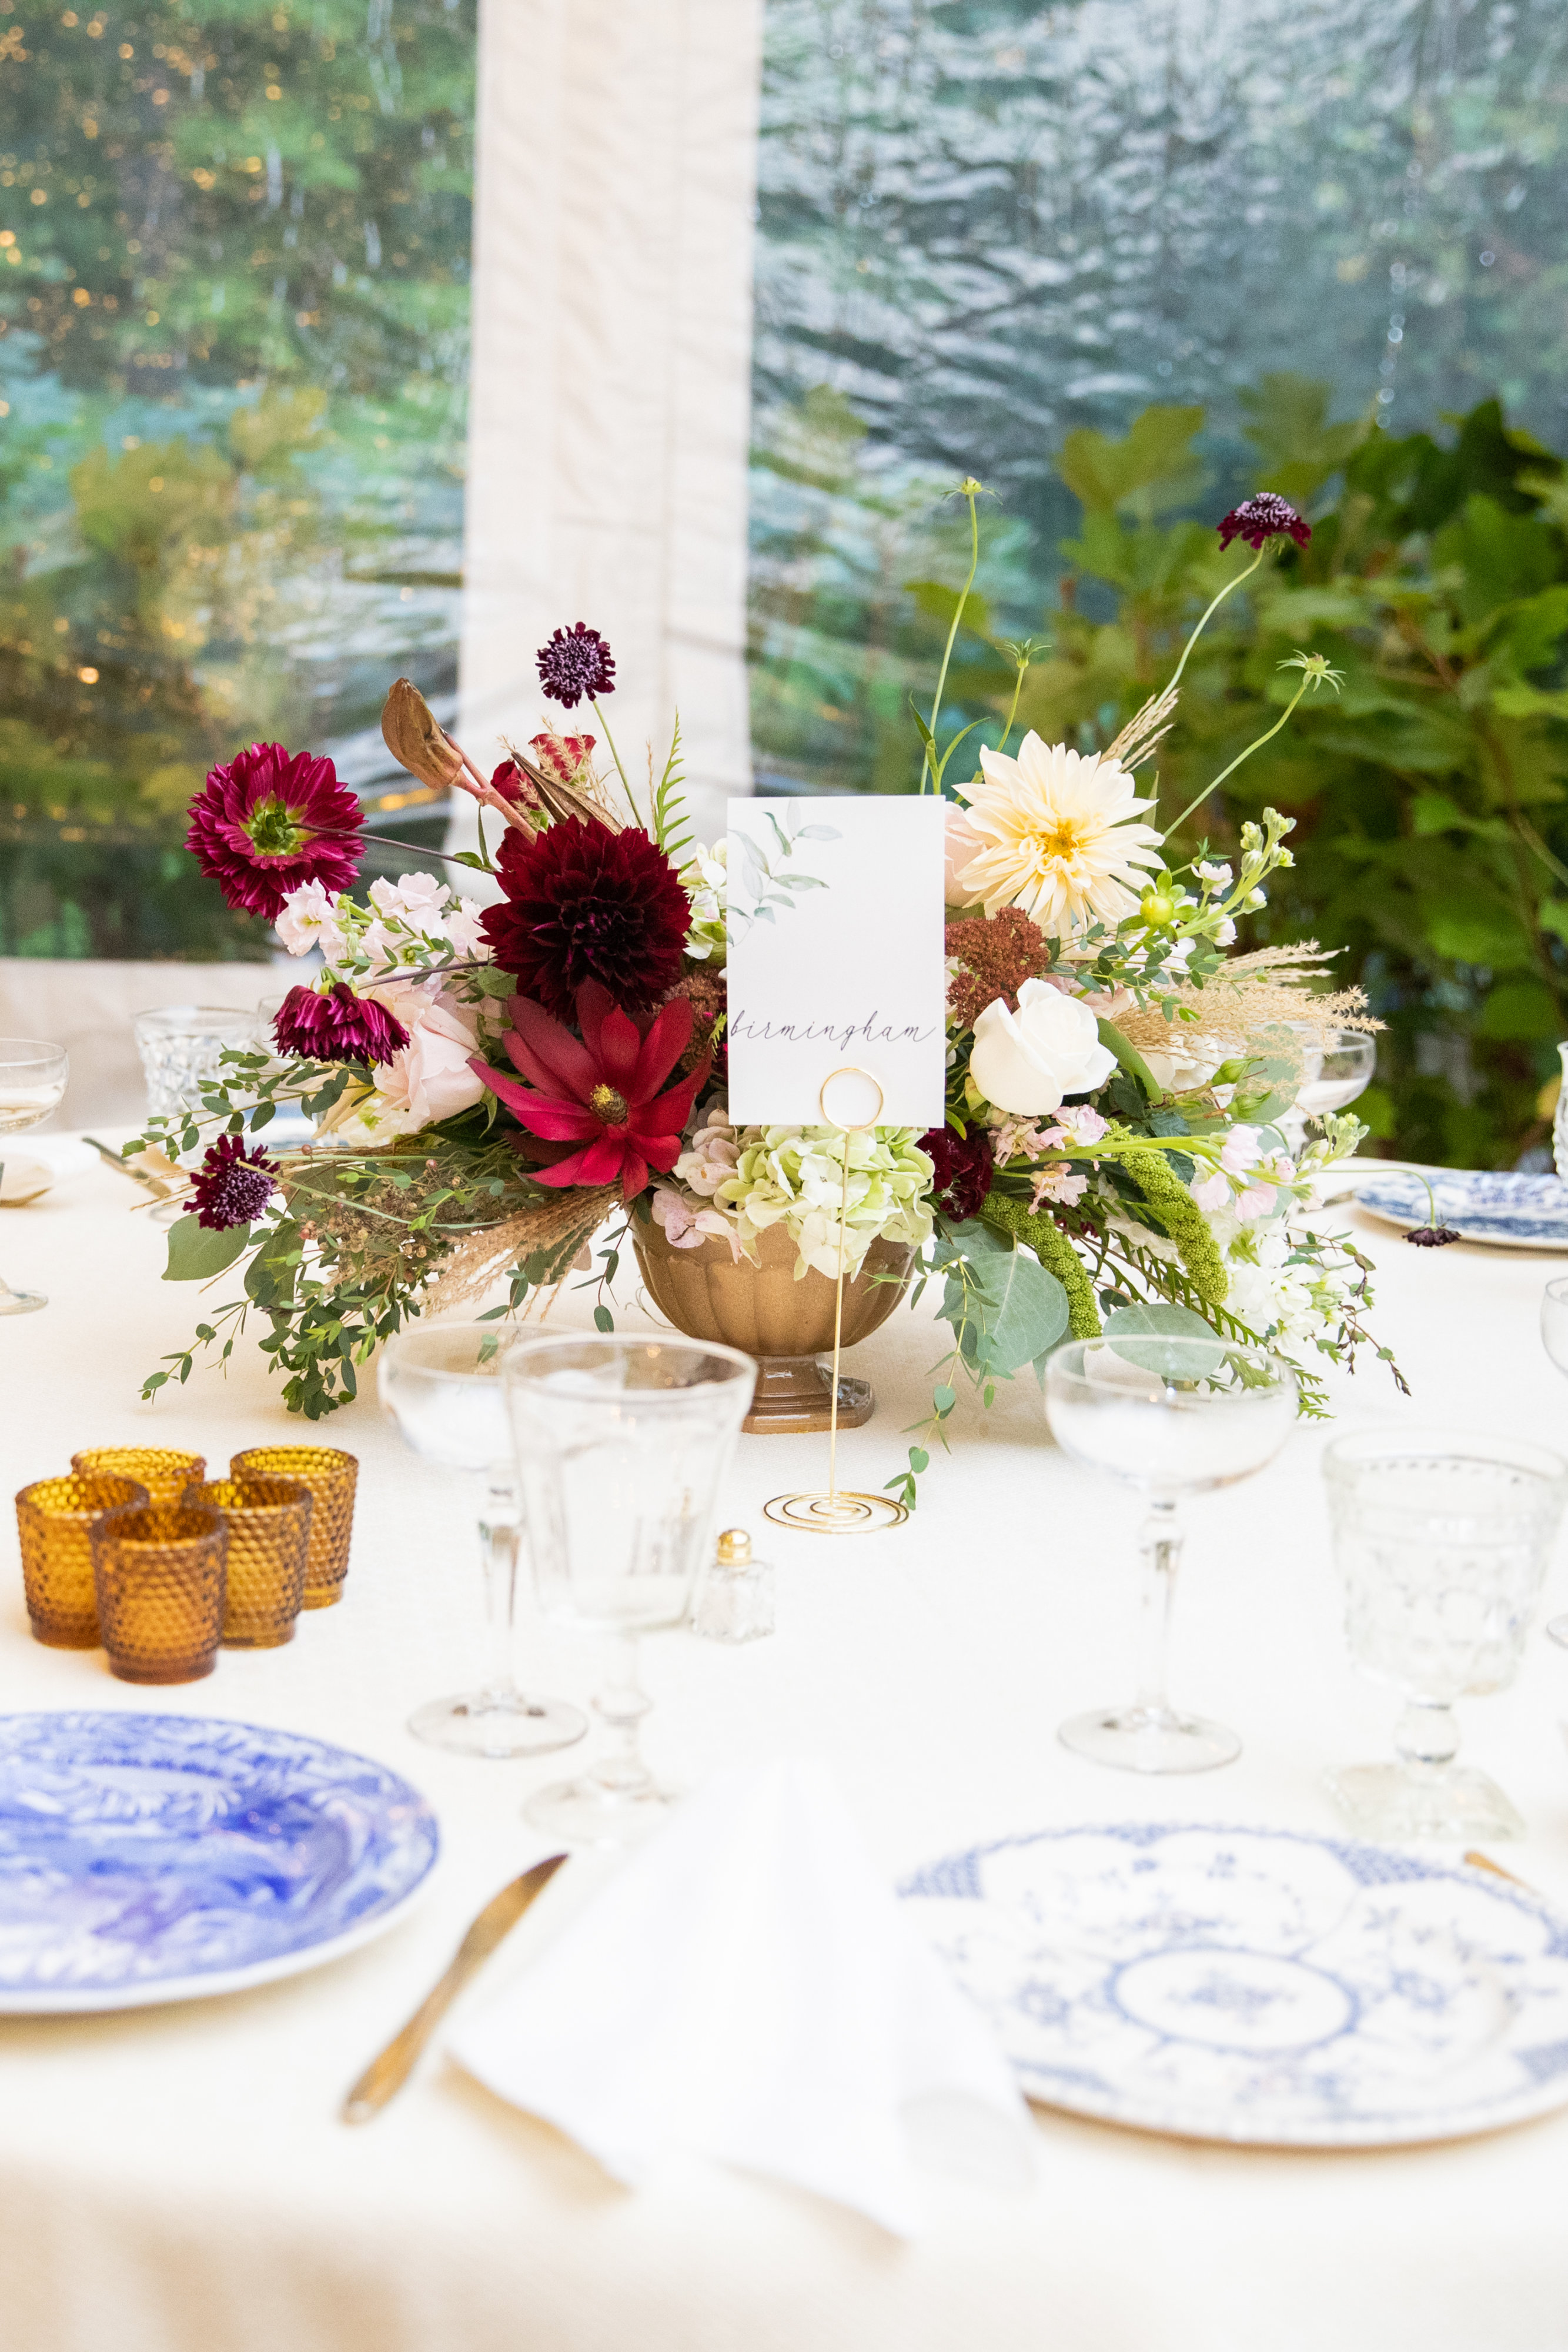 StefanieKamermanPhotography-MelanieandBenjamin-Wedding-Bethesda,MD-2019-10-12-329